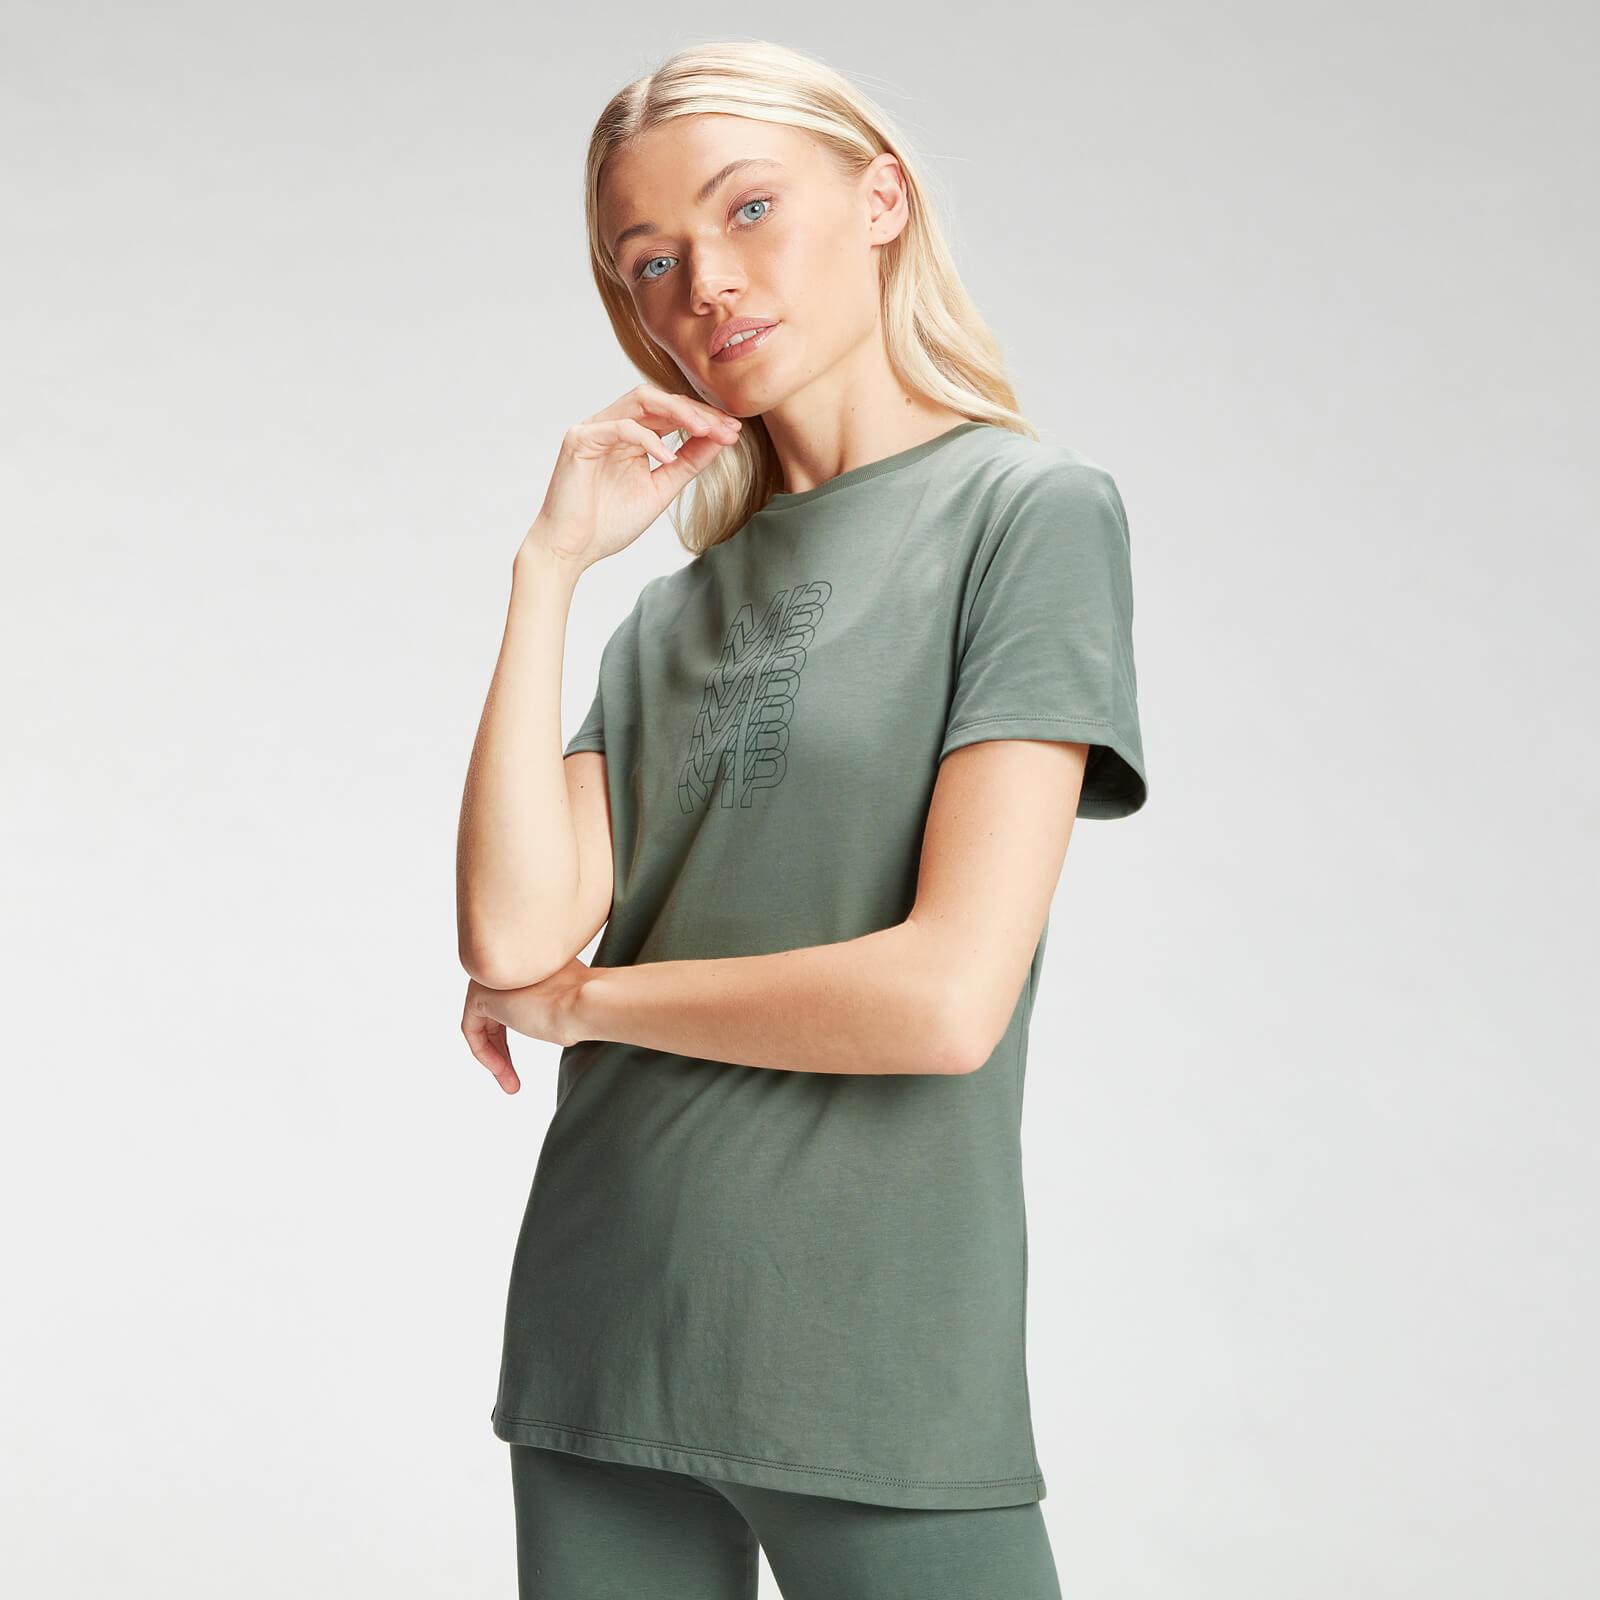 Купить MP Women's Repeat MP T-Shirt - Cactus - XXL, Myprotein International